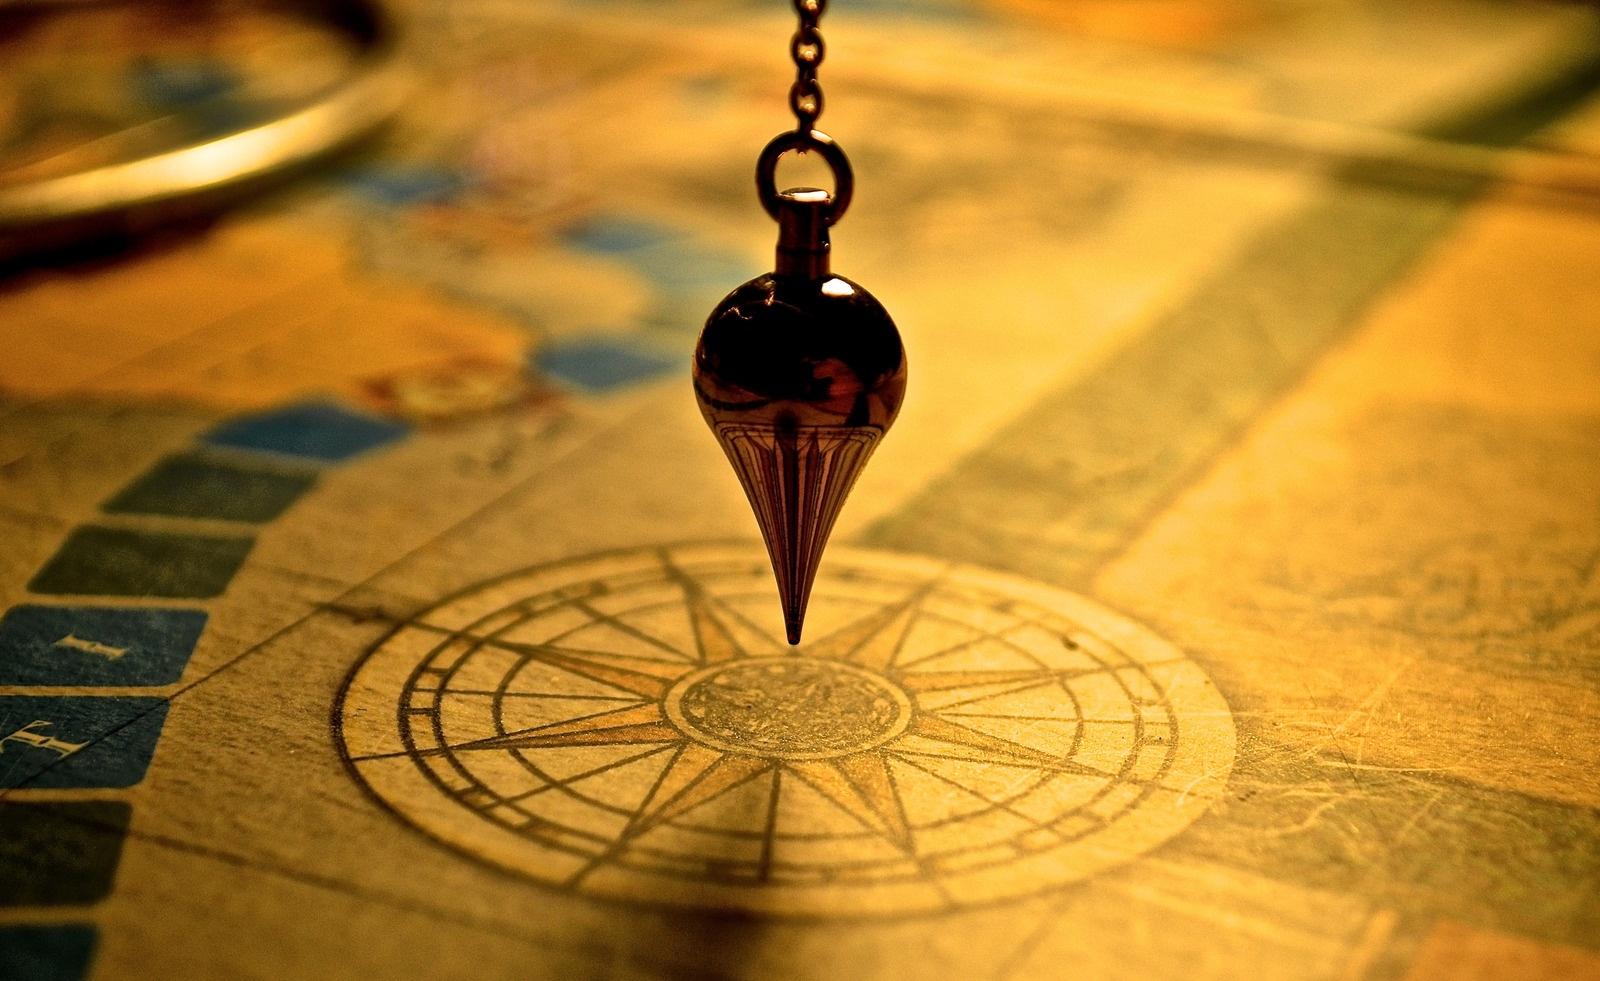 Foto von poupoune05--4055465: https://www.canva.com/photos/MADQ45srtgI-pendulum-on-a-map/